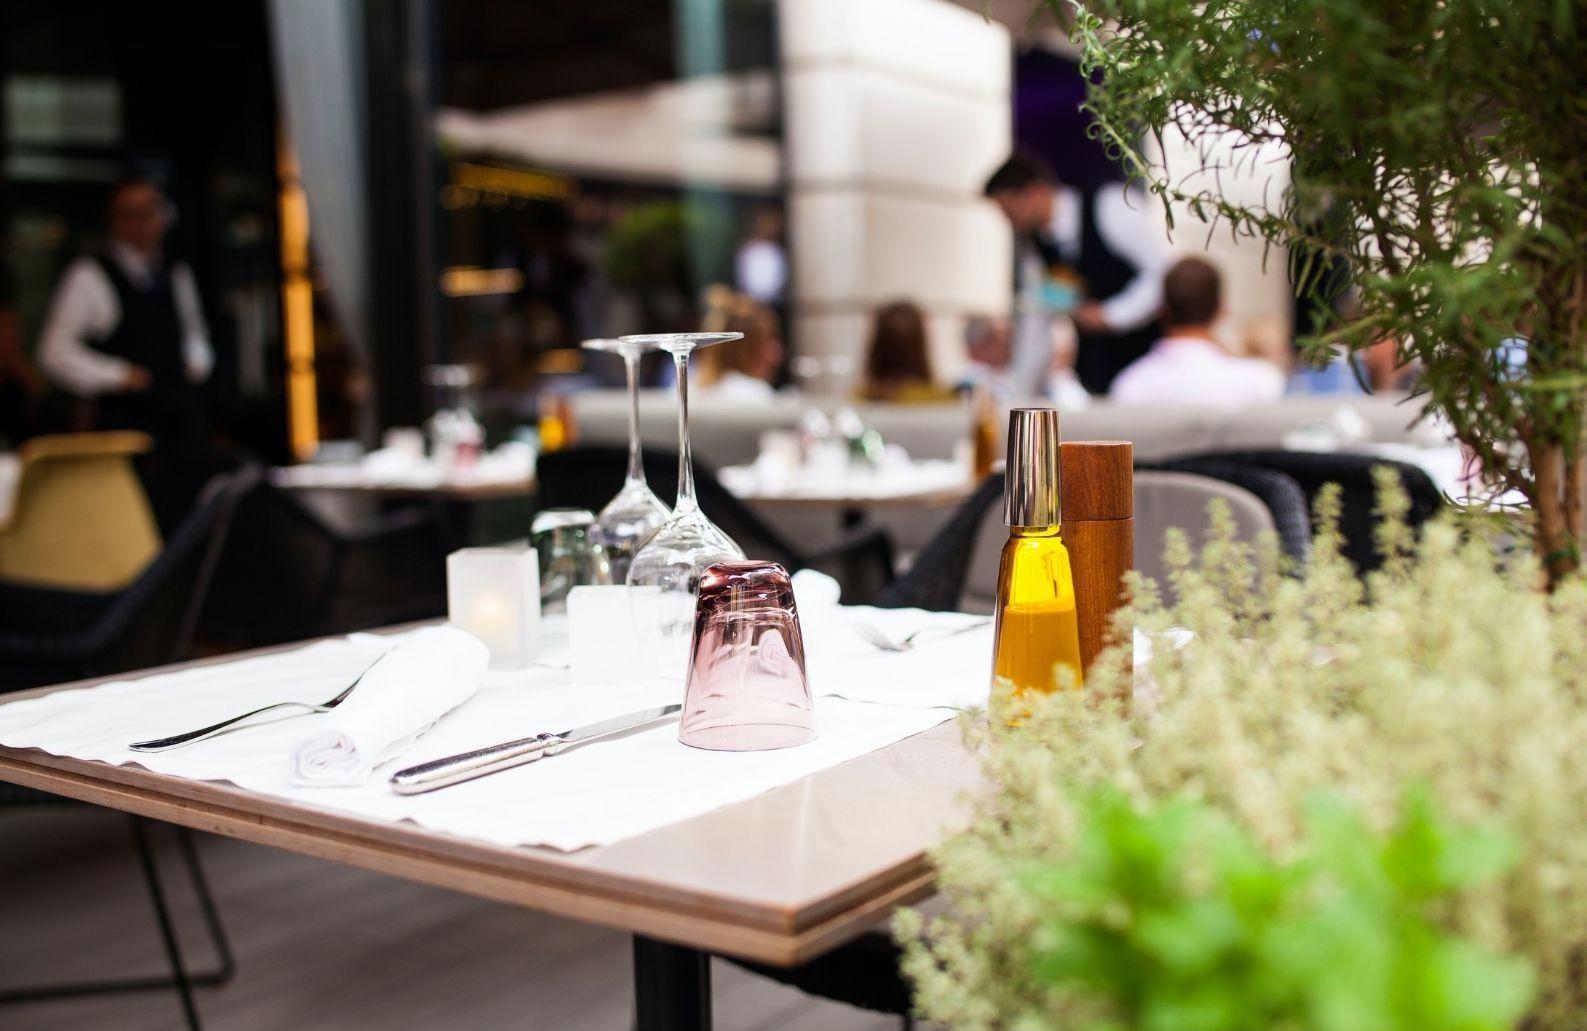 restaurant-outdoor-seating.jpg